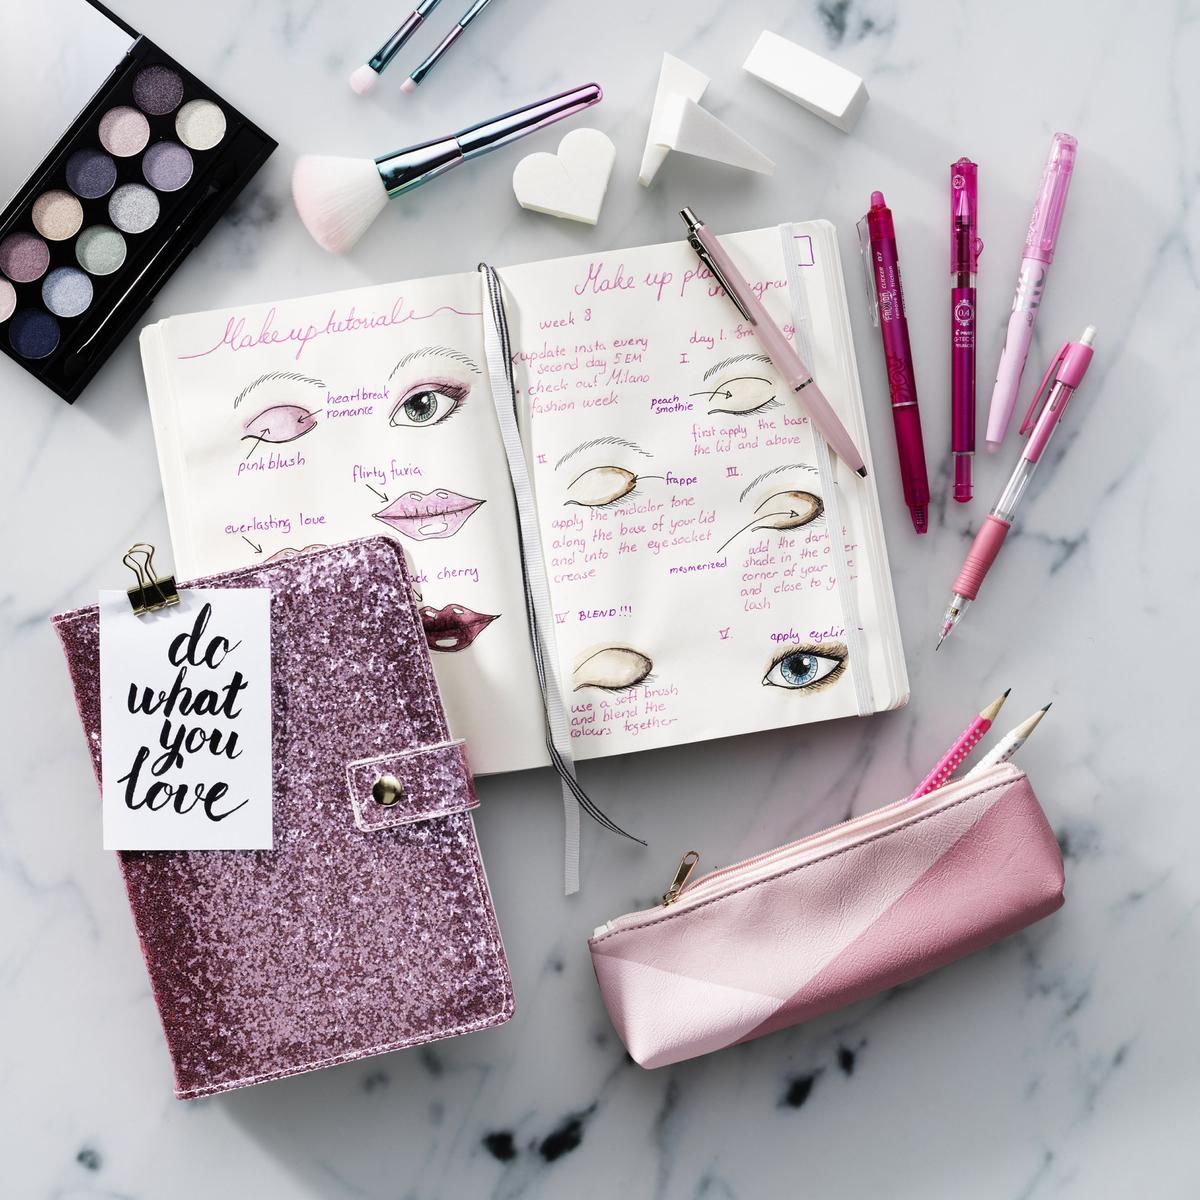 Design makeup ideas in your bullet journal